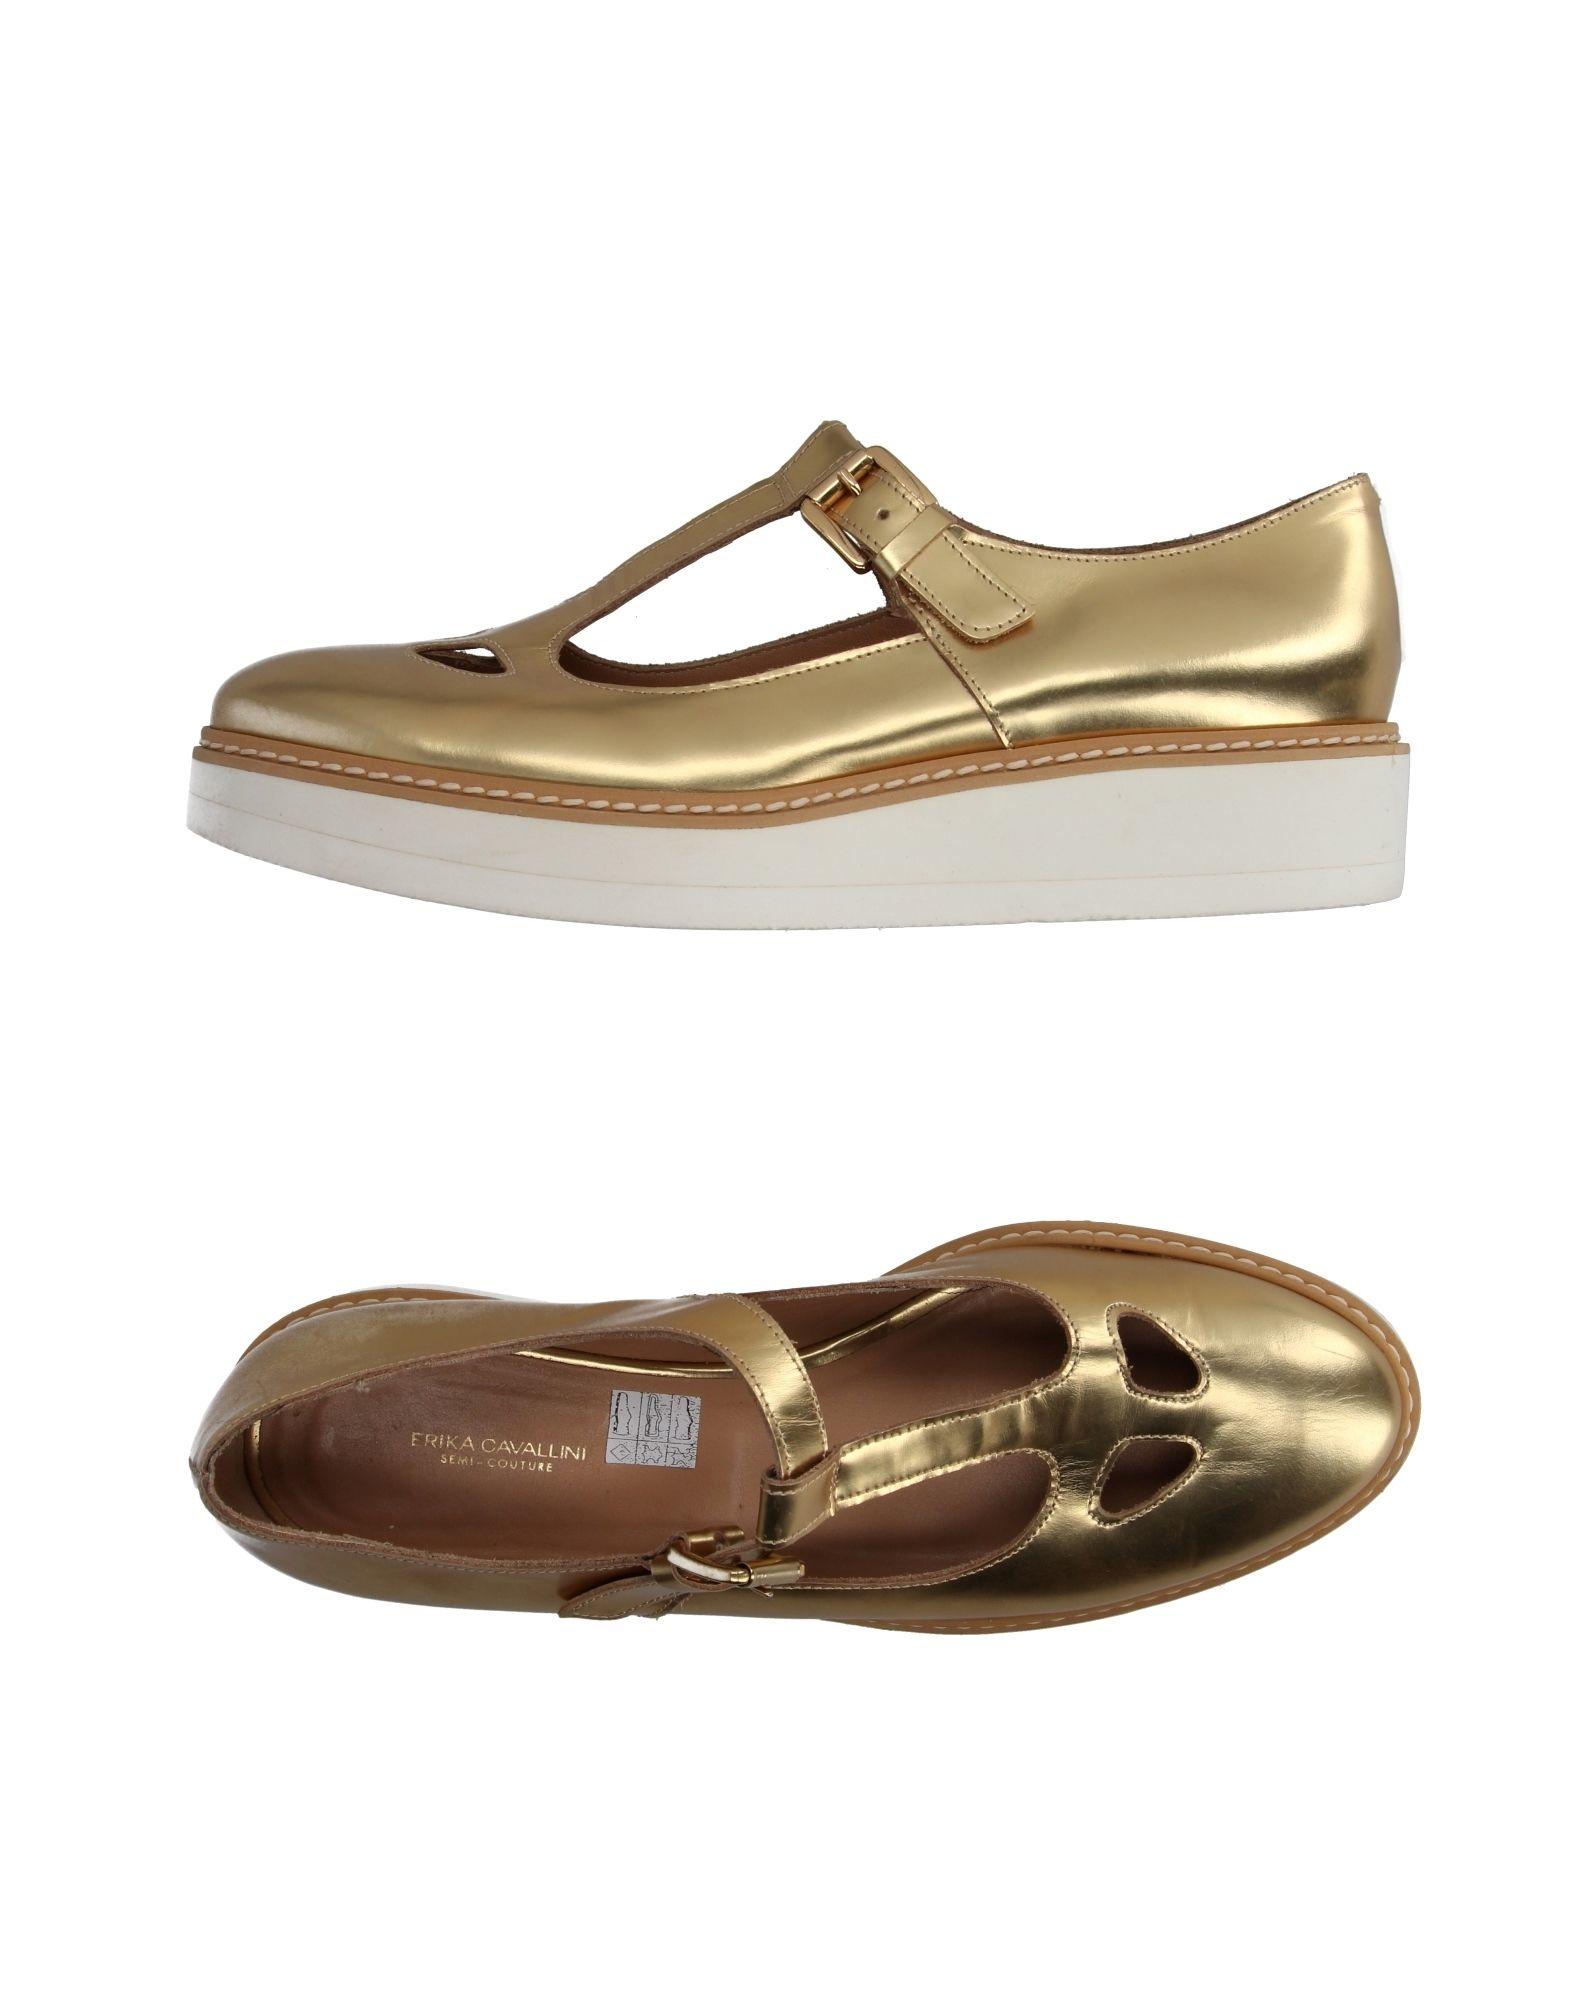 Cavallini Shoes Womens